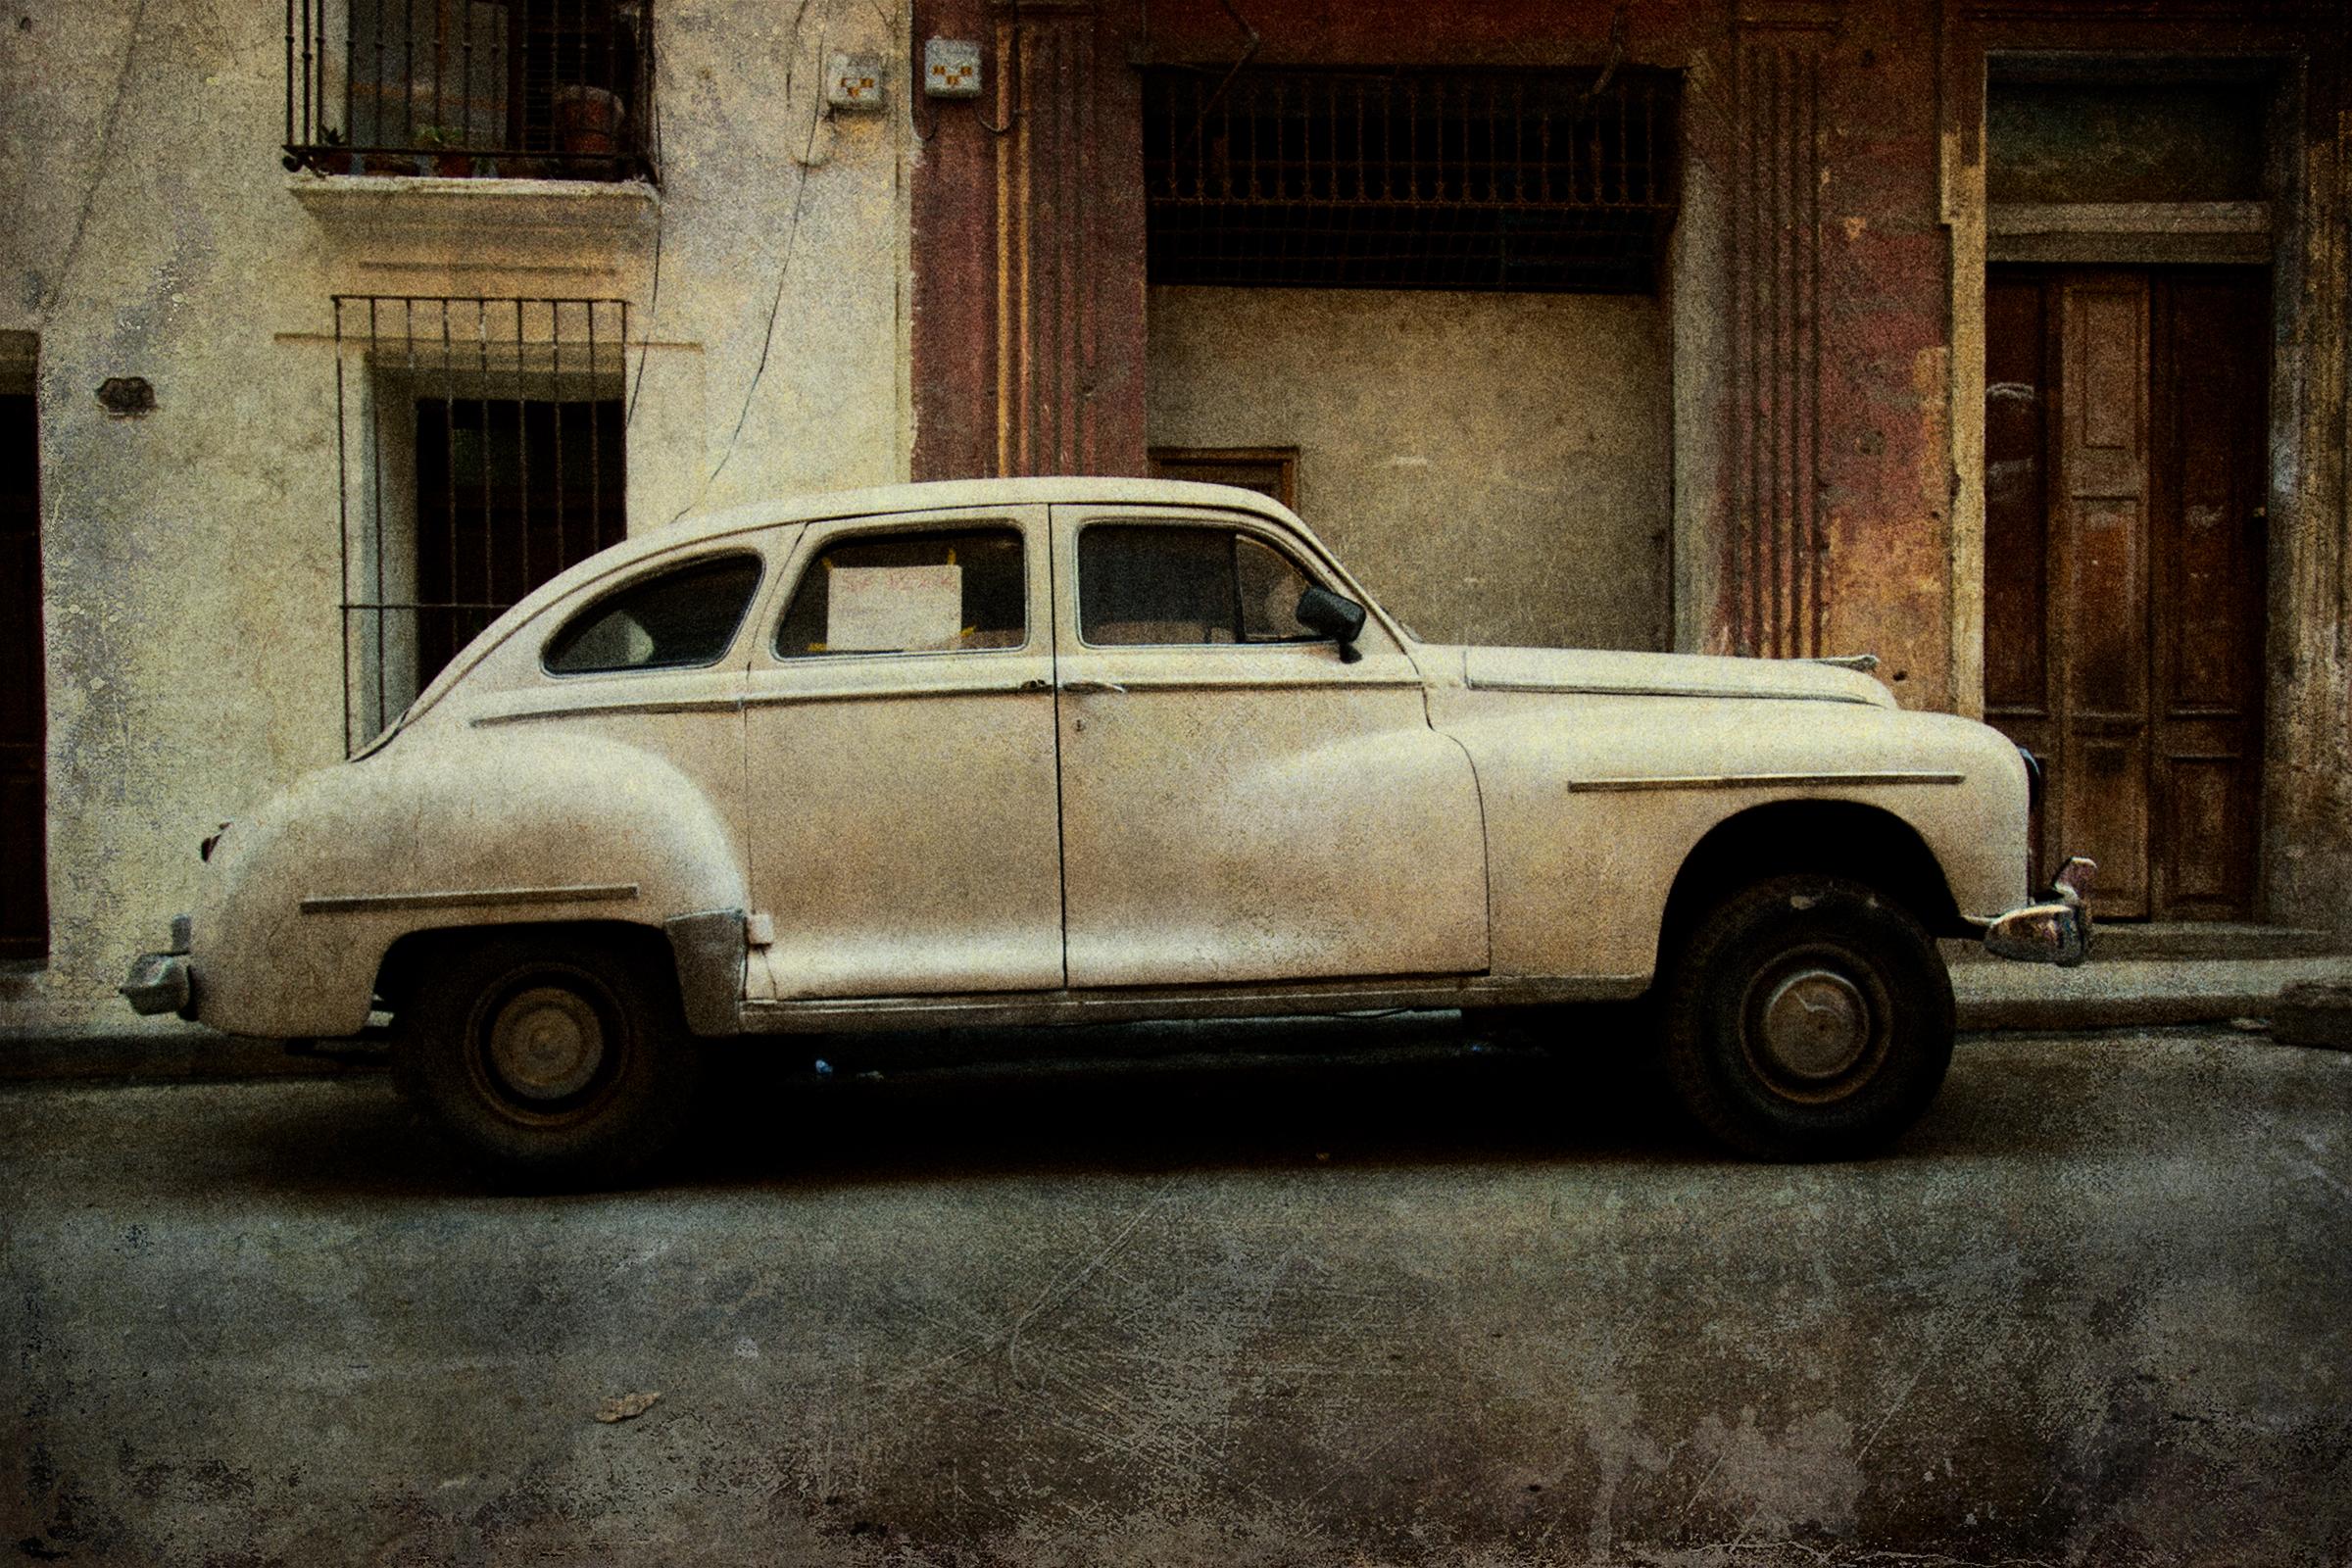 White Car #1